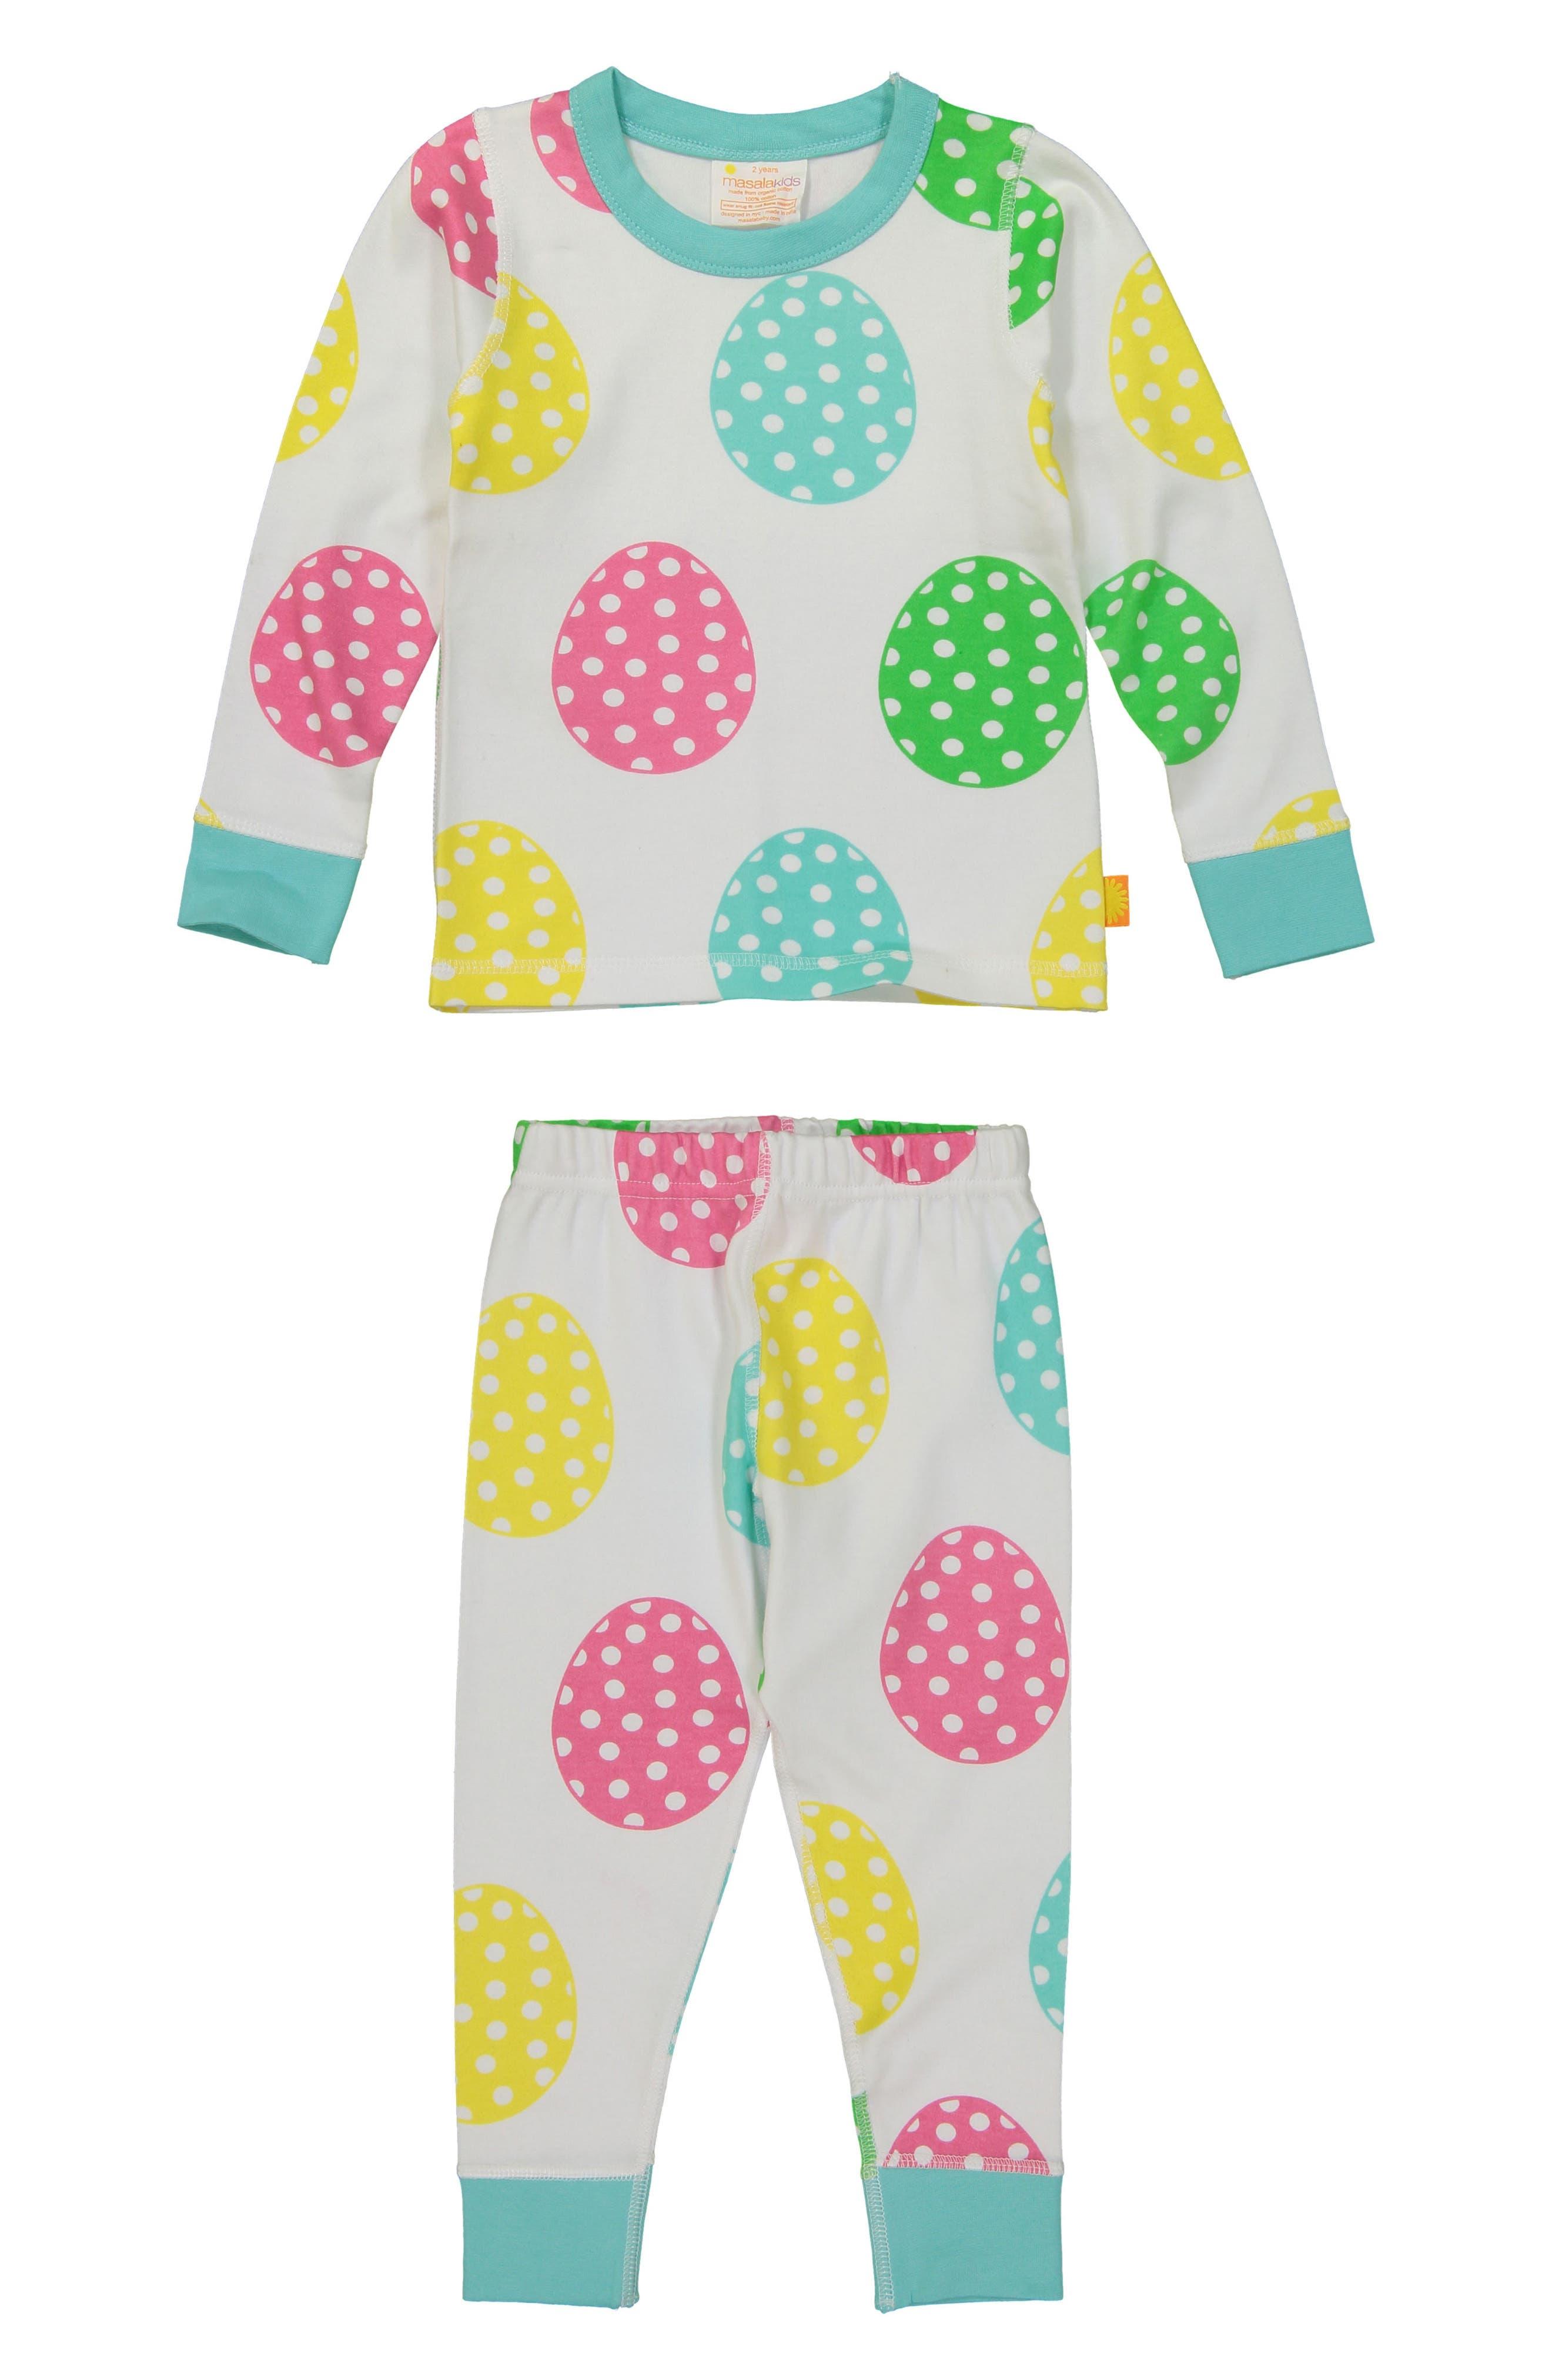 Rainbow Fitted Two-Piece Organic Cotton Pajamas,                         Main,                         color, White Multi